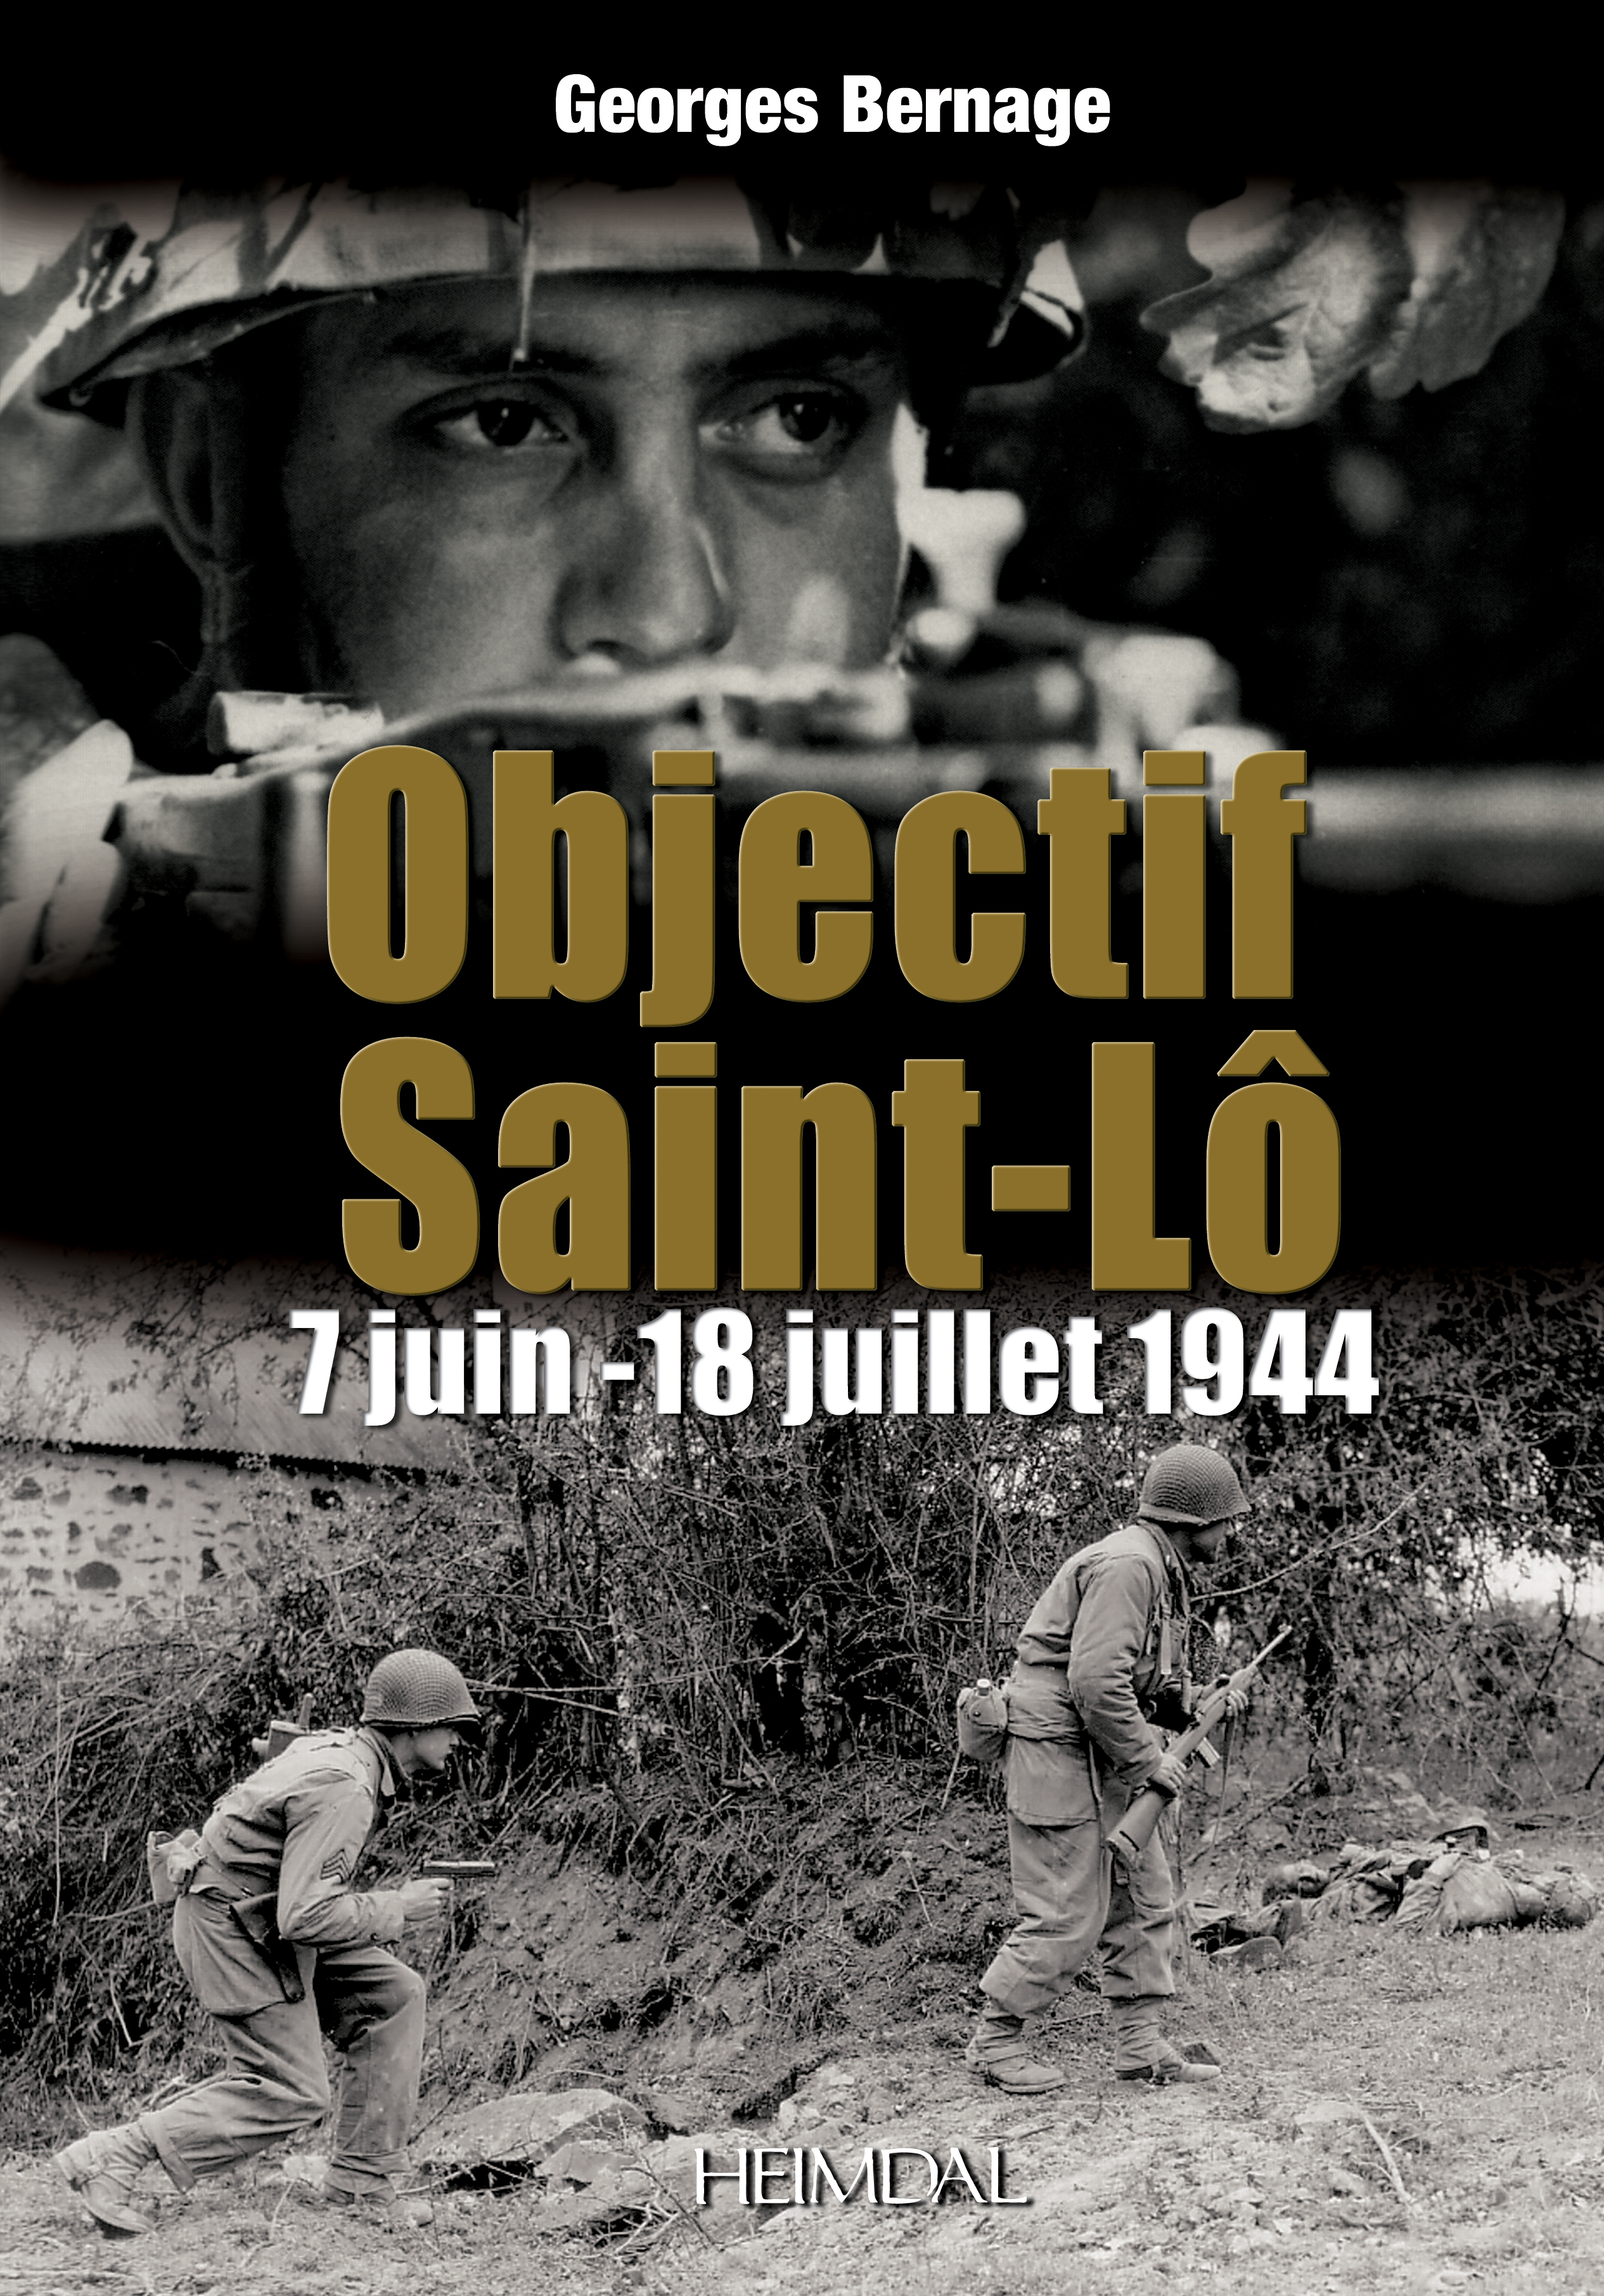 OBJECTIF SAINT-LO 7 JUIN - 18 JUILLET 1944